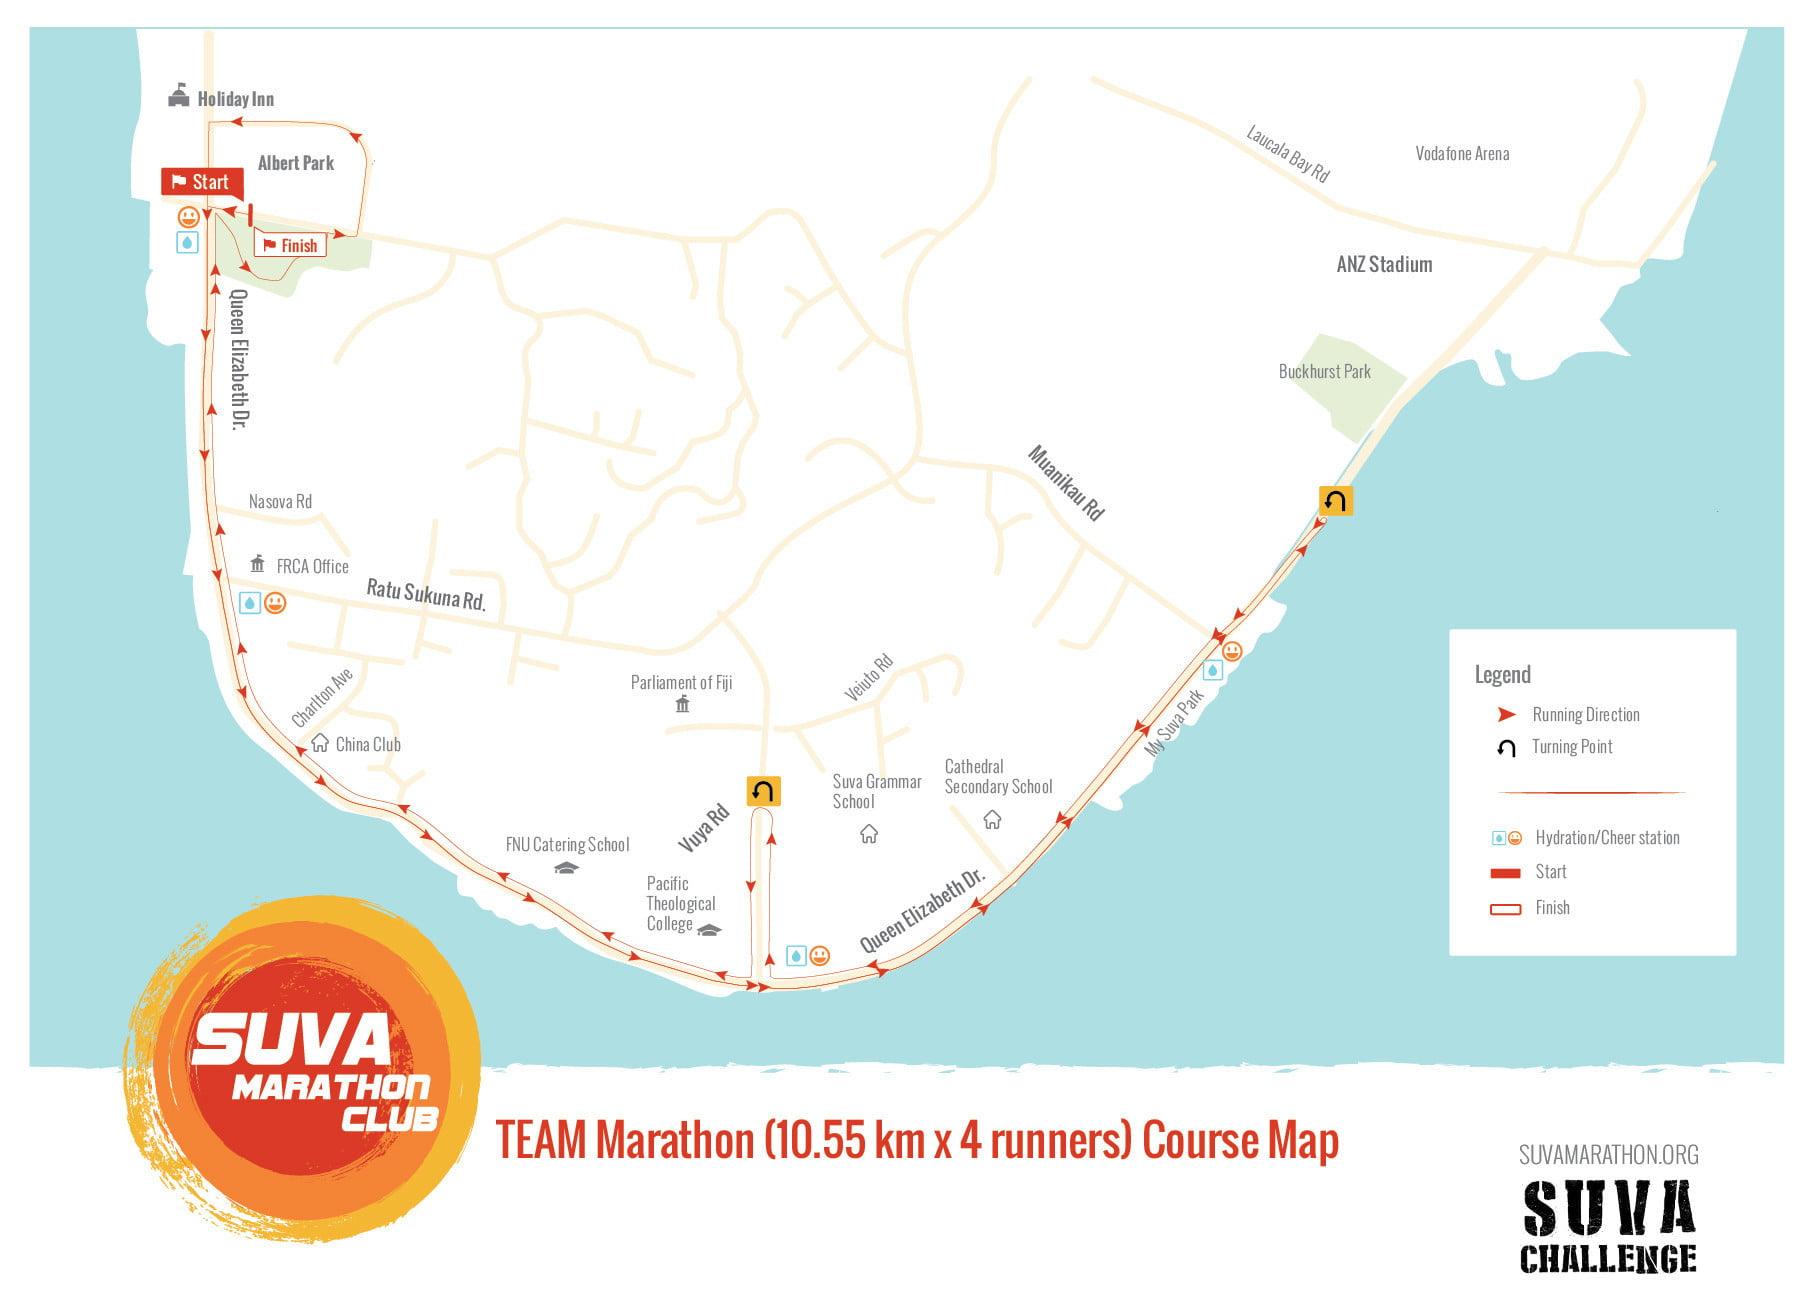 2017 Suva Challenge Team Marathon